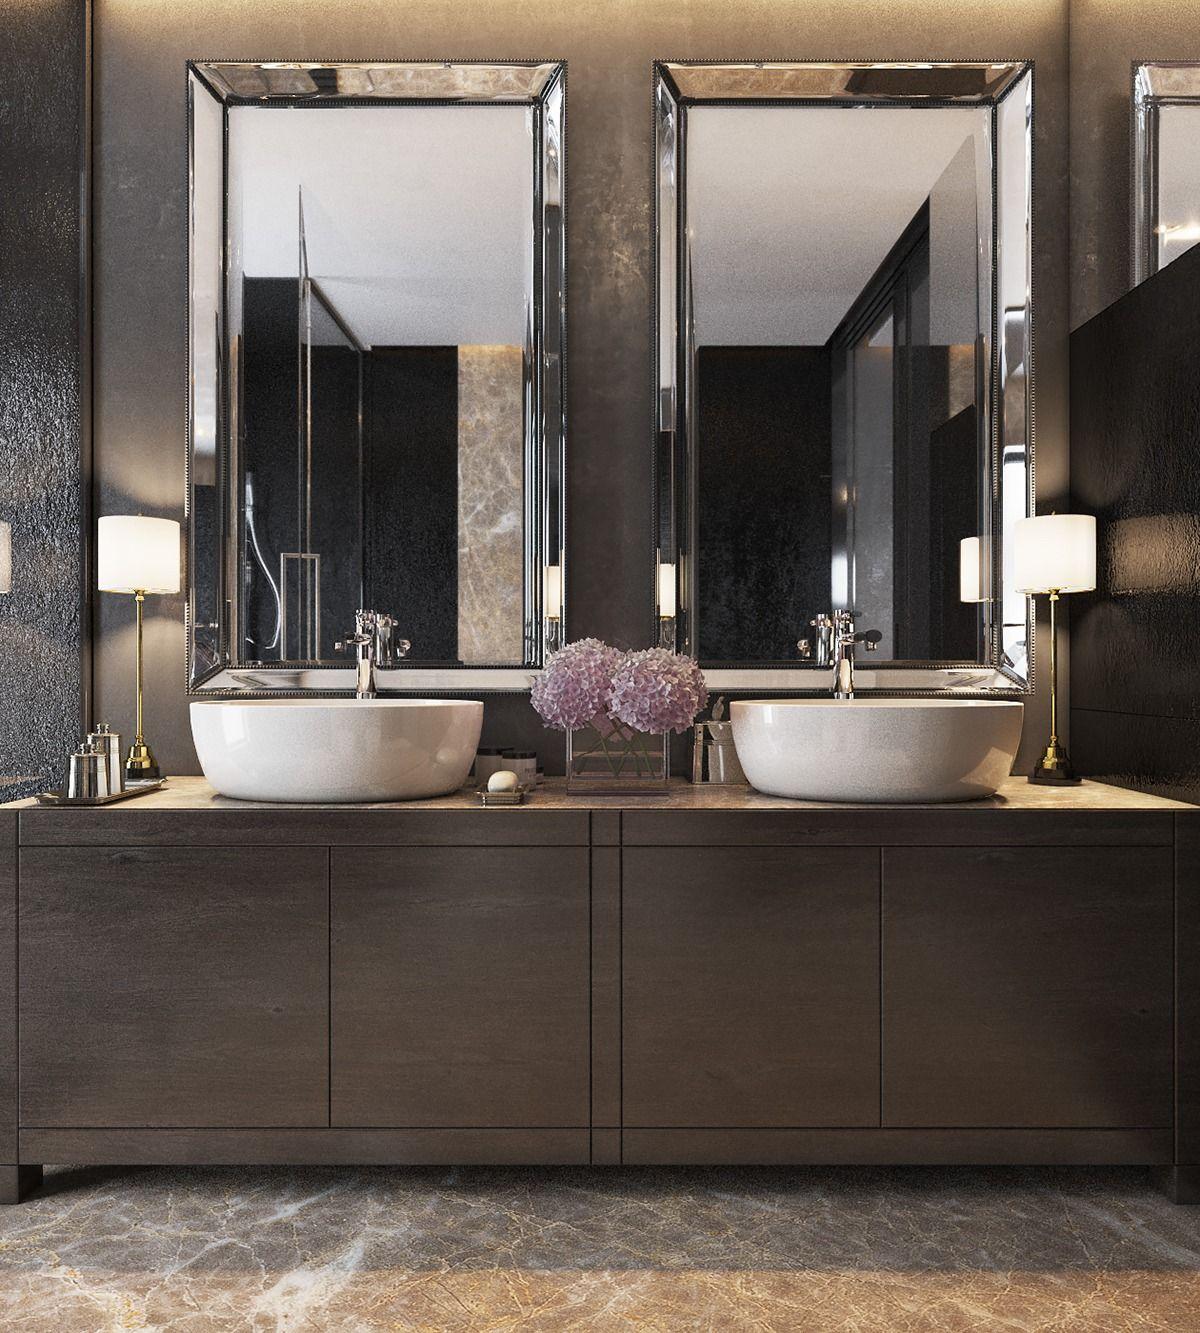 Three luxurious apartments with dark modern interiors vessel sink